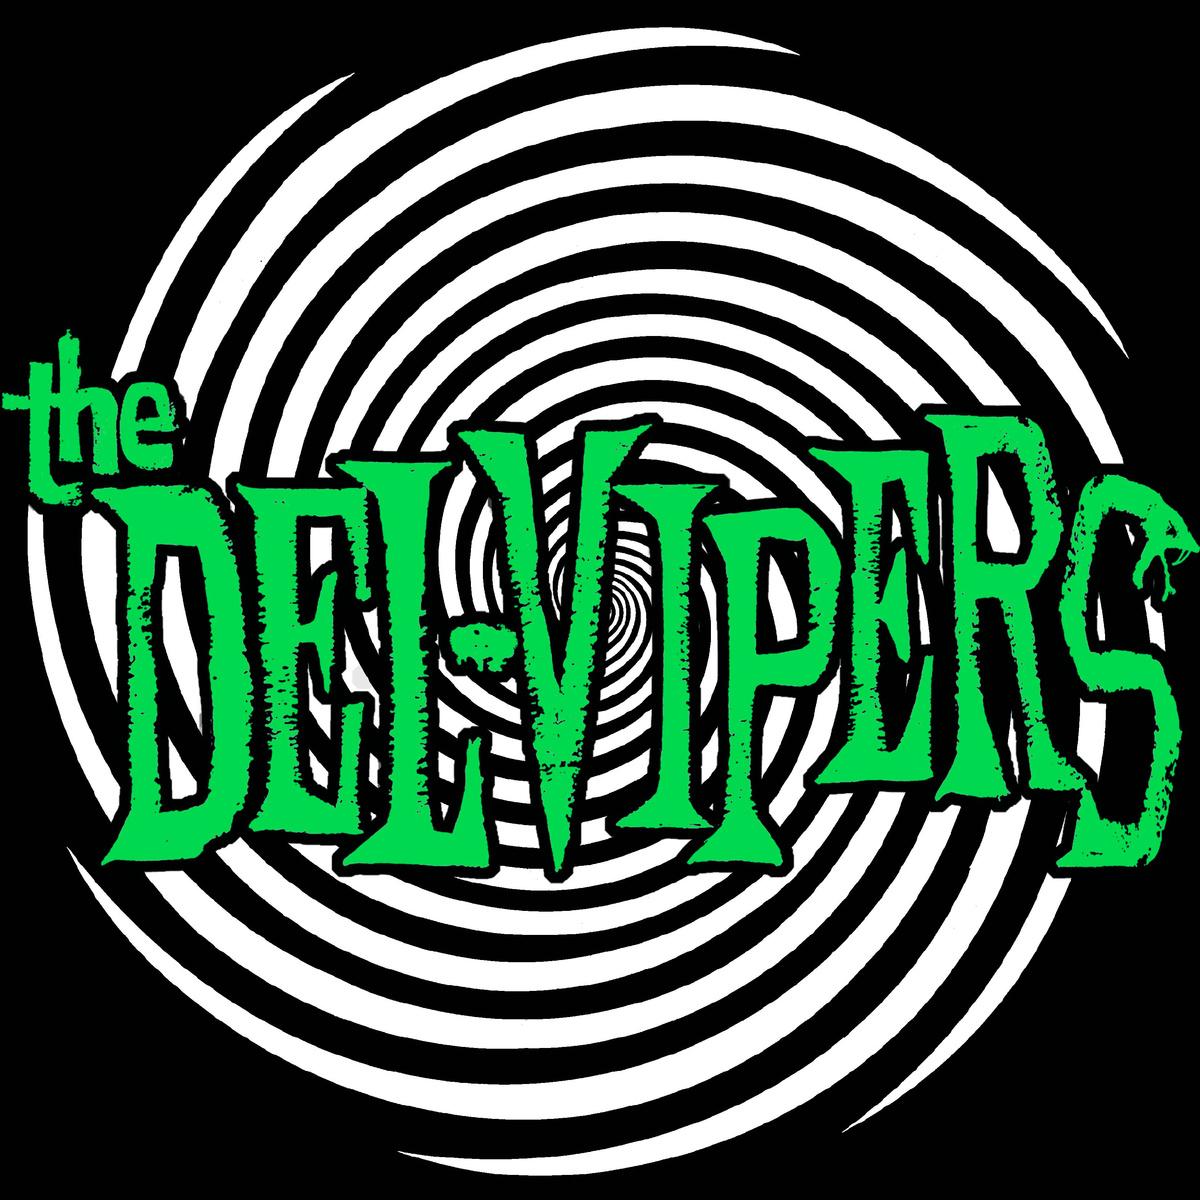 del-vipers-logo.jpg